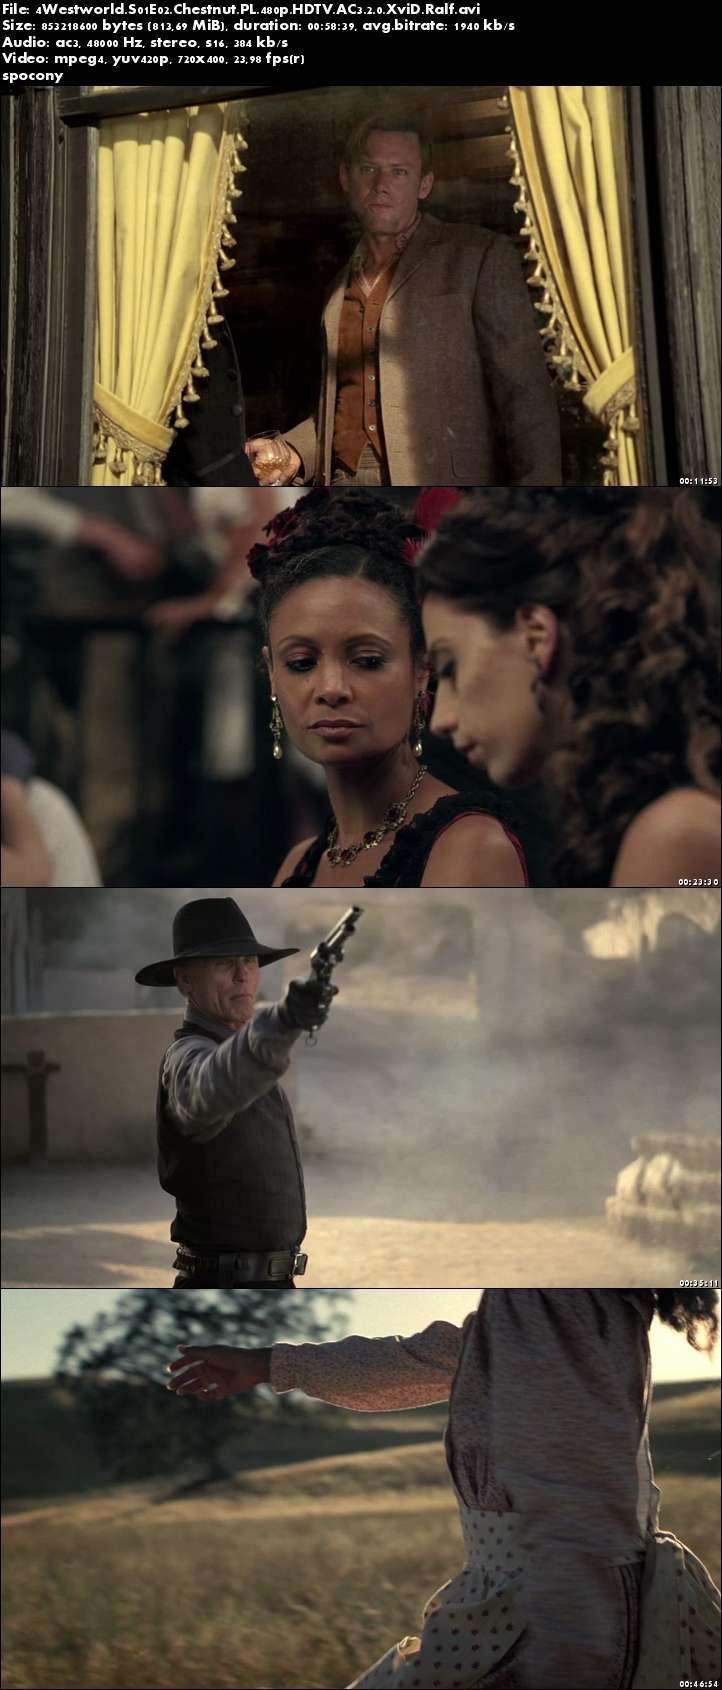 Westworld (2016) {Sezon 1} (Pełen sezon) PL.480p.HDTV.AC3.2.0.XviD.Ralf [Lektor PL]